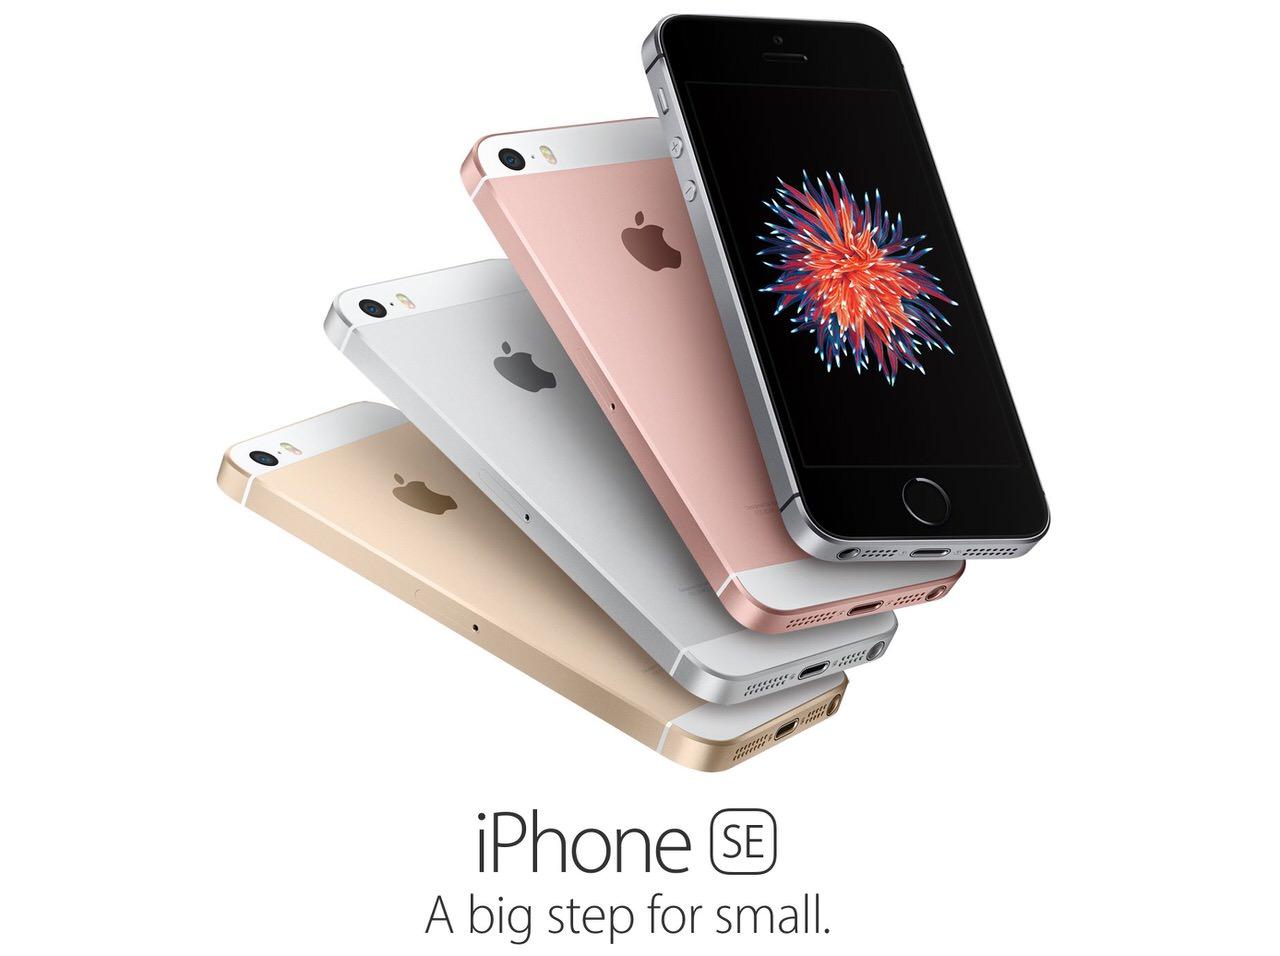 【IIJmio】「iPhone SE」「iPad Pro 9.7インチ」で動作確認OKと発表 #IIJ